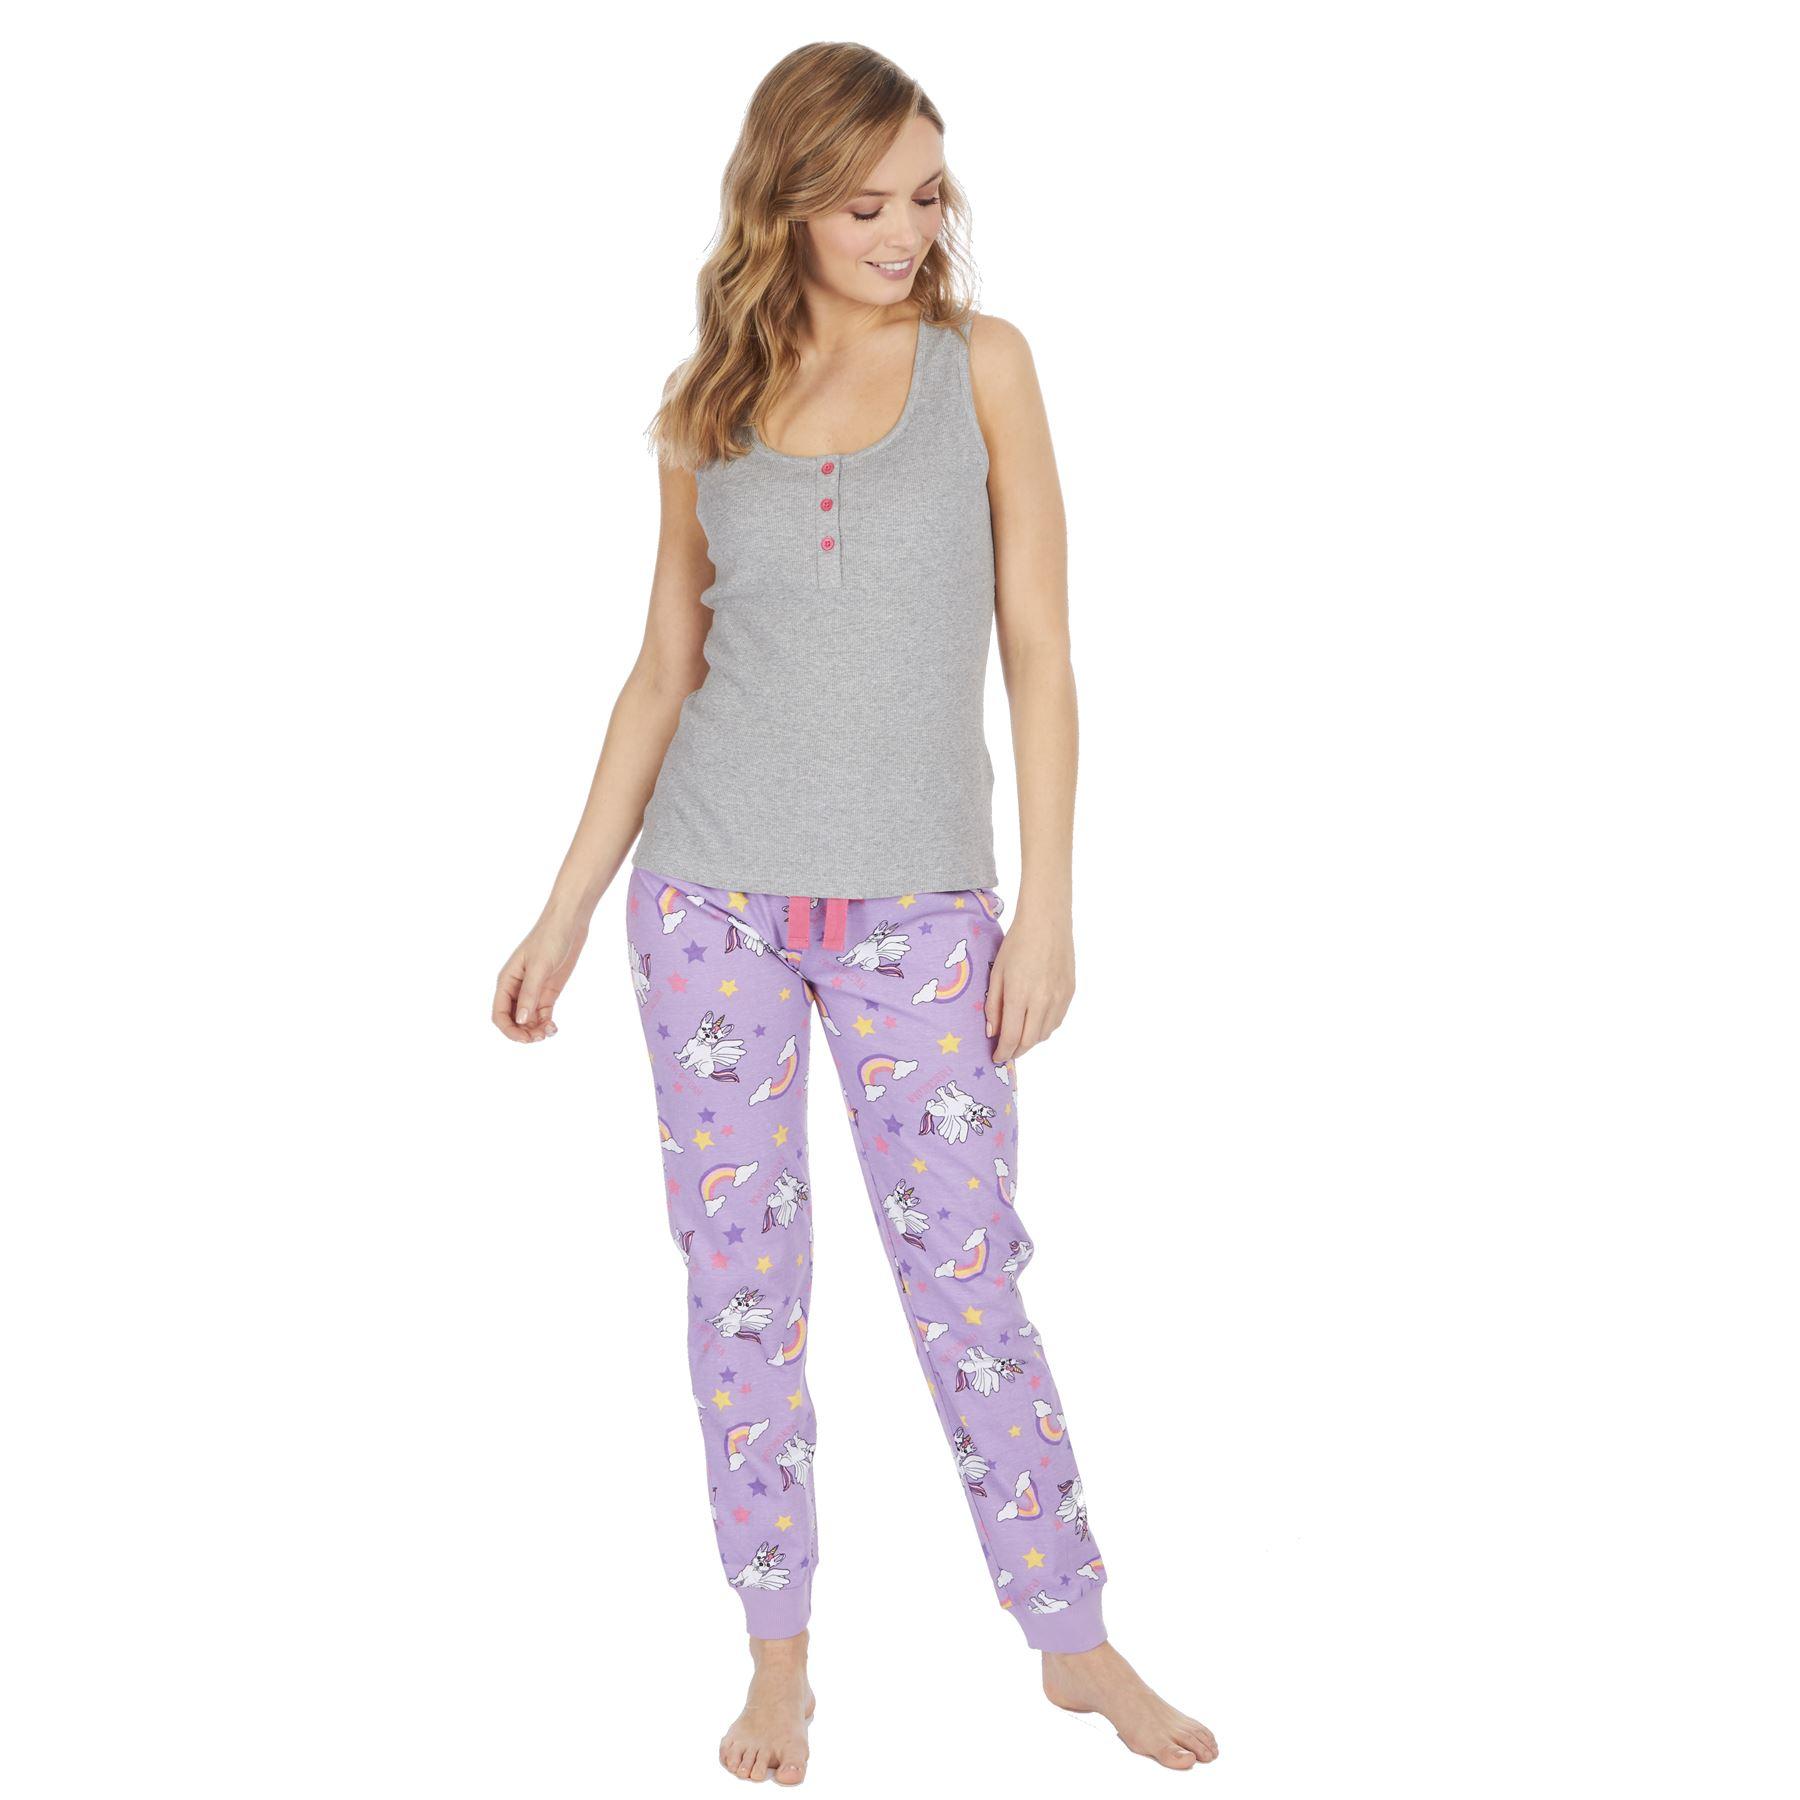 Womens-Ladies-Cotton-Pyjamas-Pyjama-PJs-Summer-Nightwear-Set-Size-8-18-NEW thumbnail 11